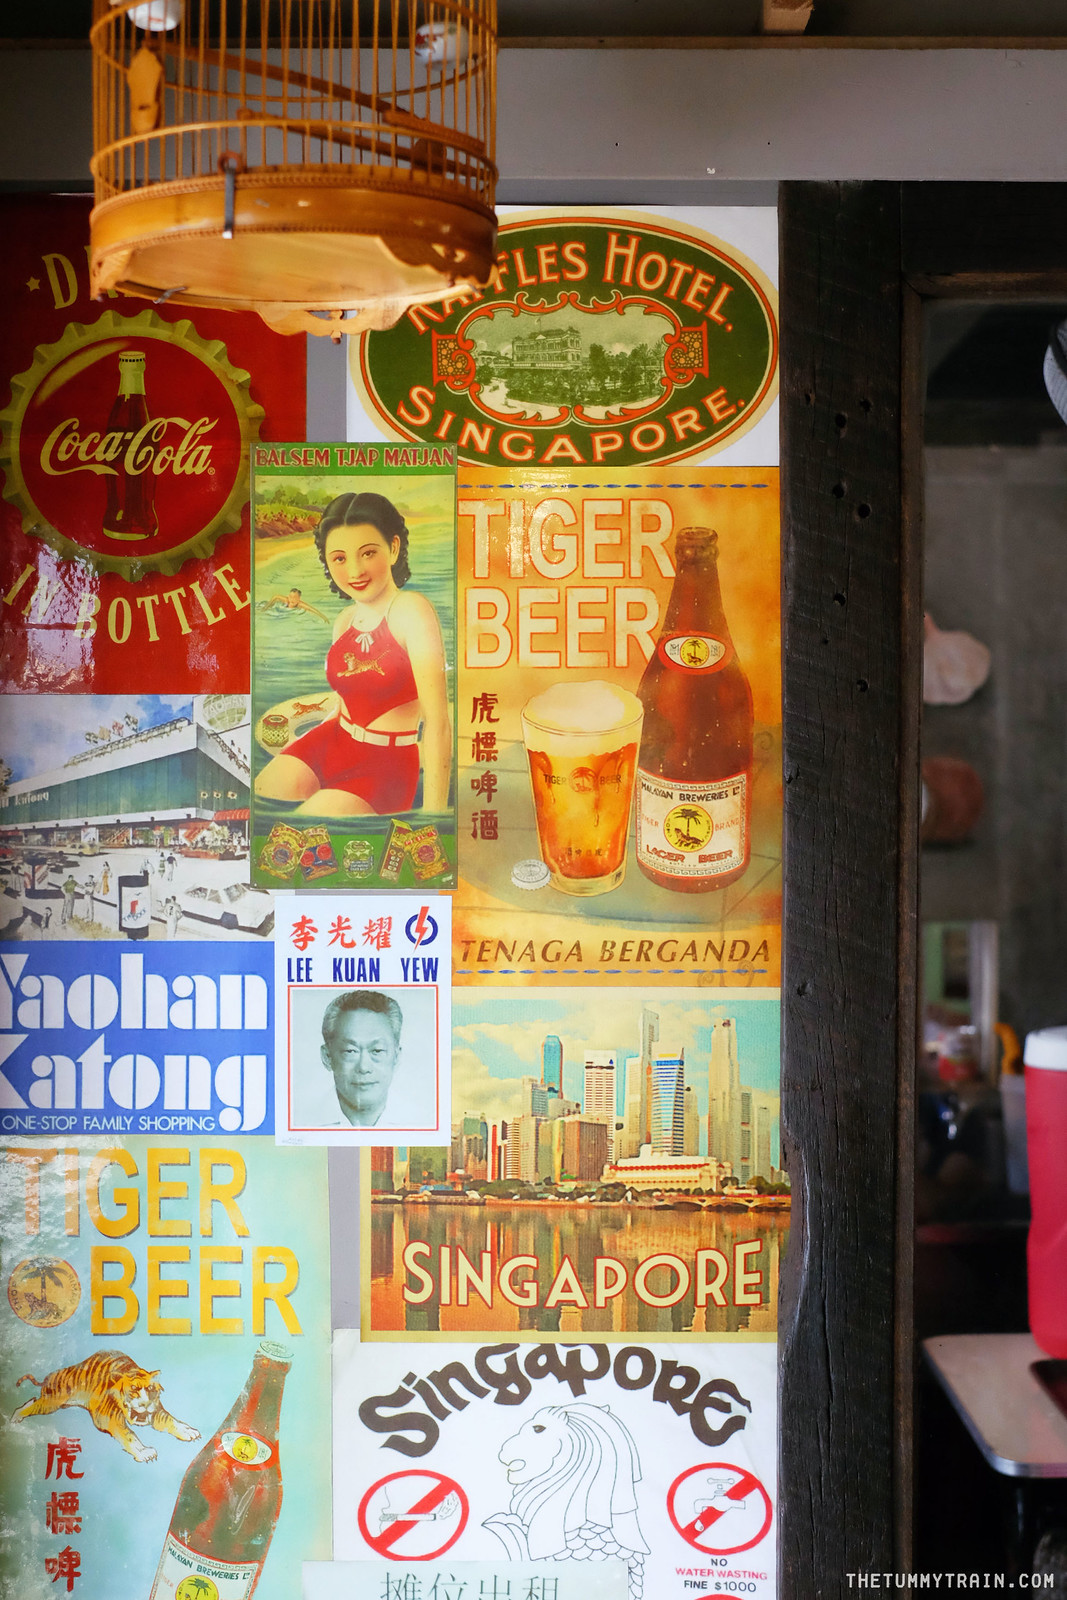 34172935721 9b1e5f8de2 h - A full serving of Singaporean fare at Shiok Shiok QC